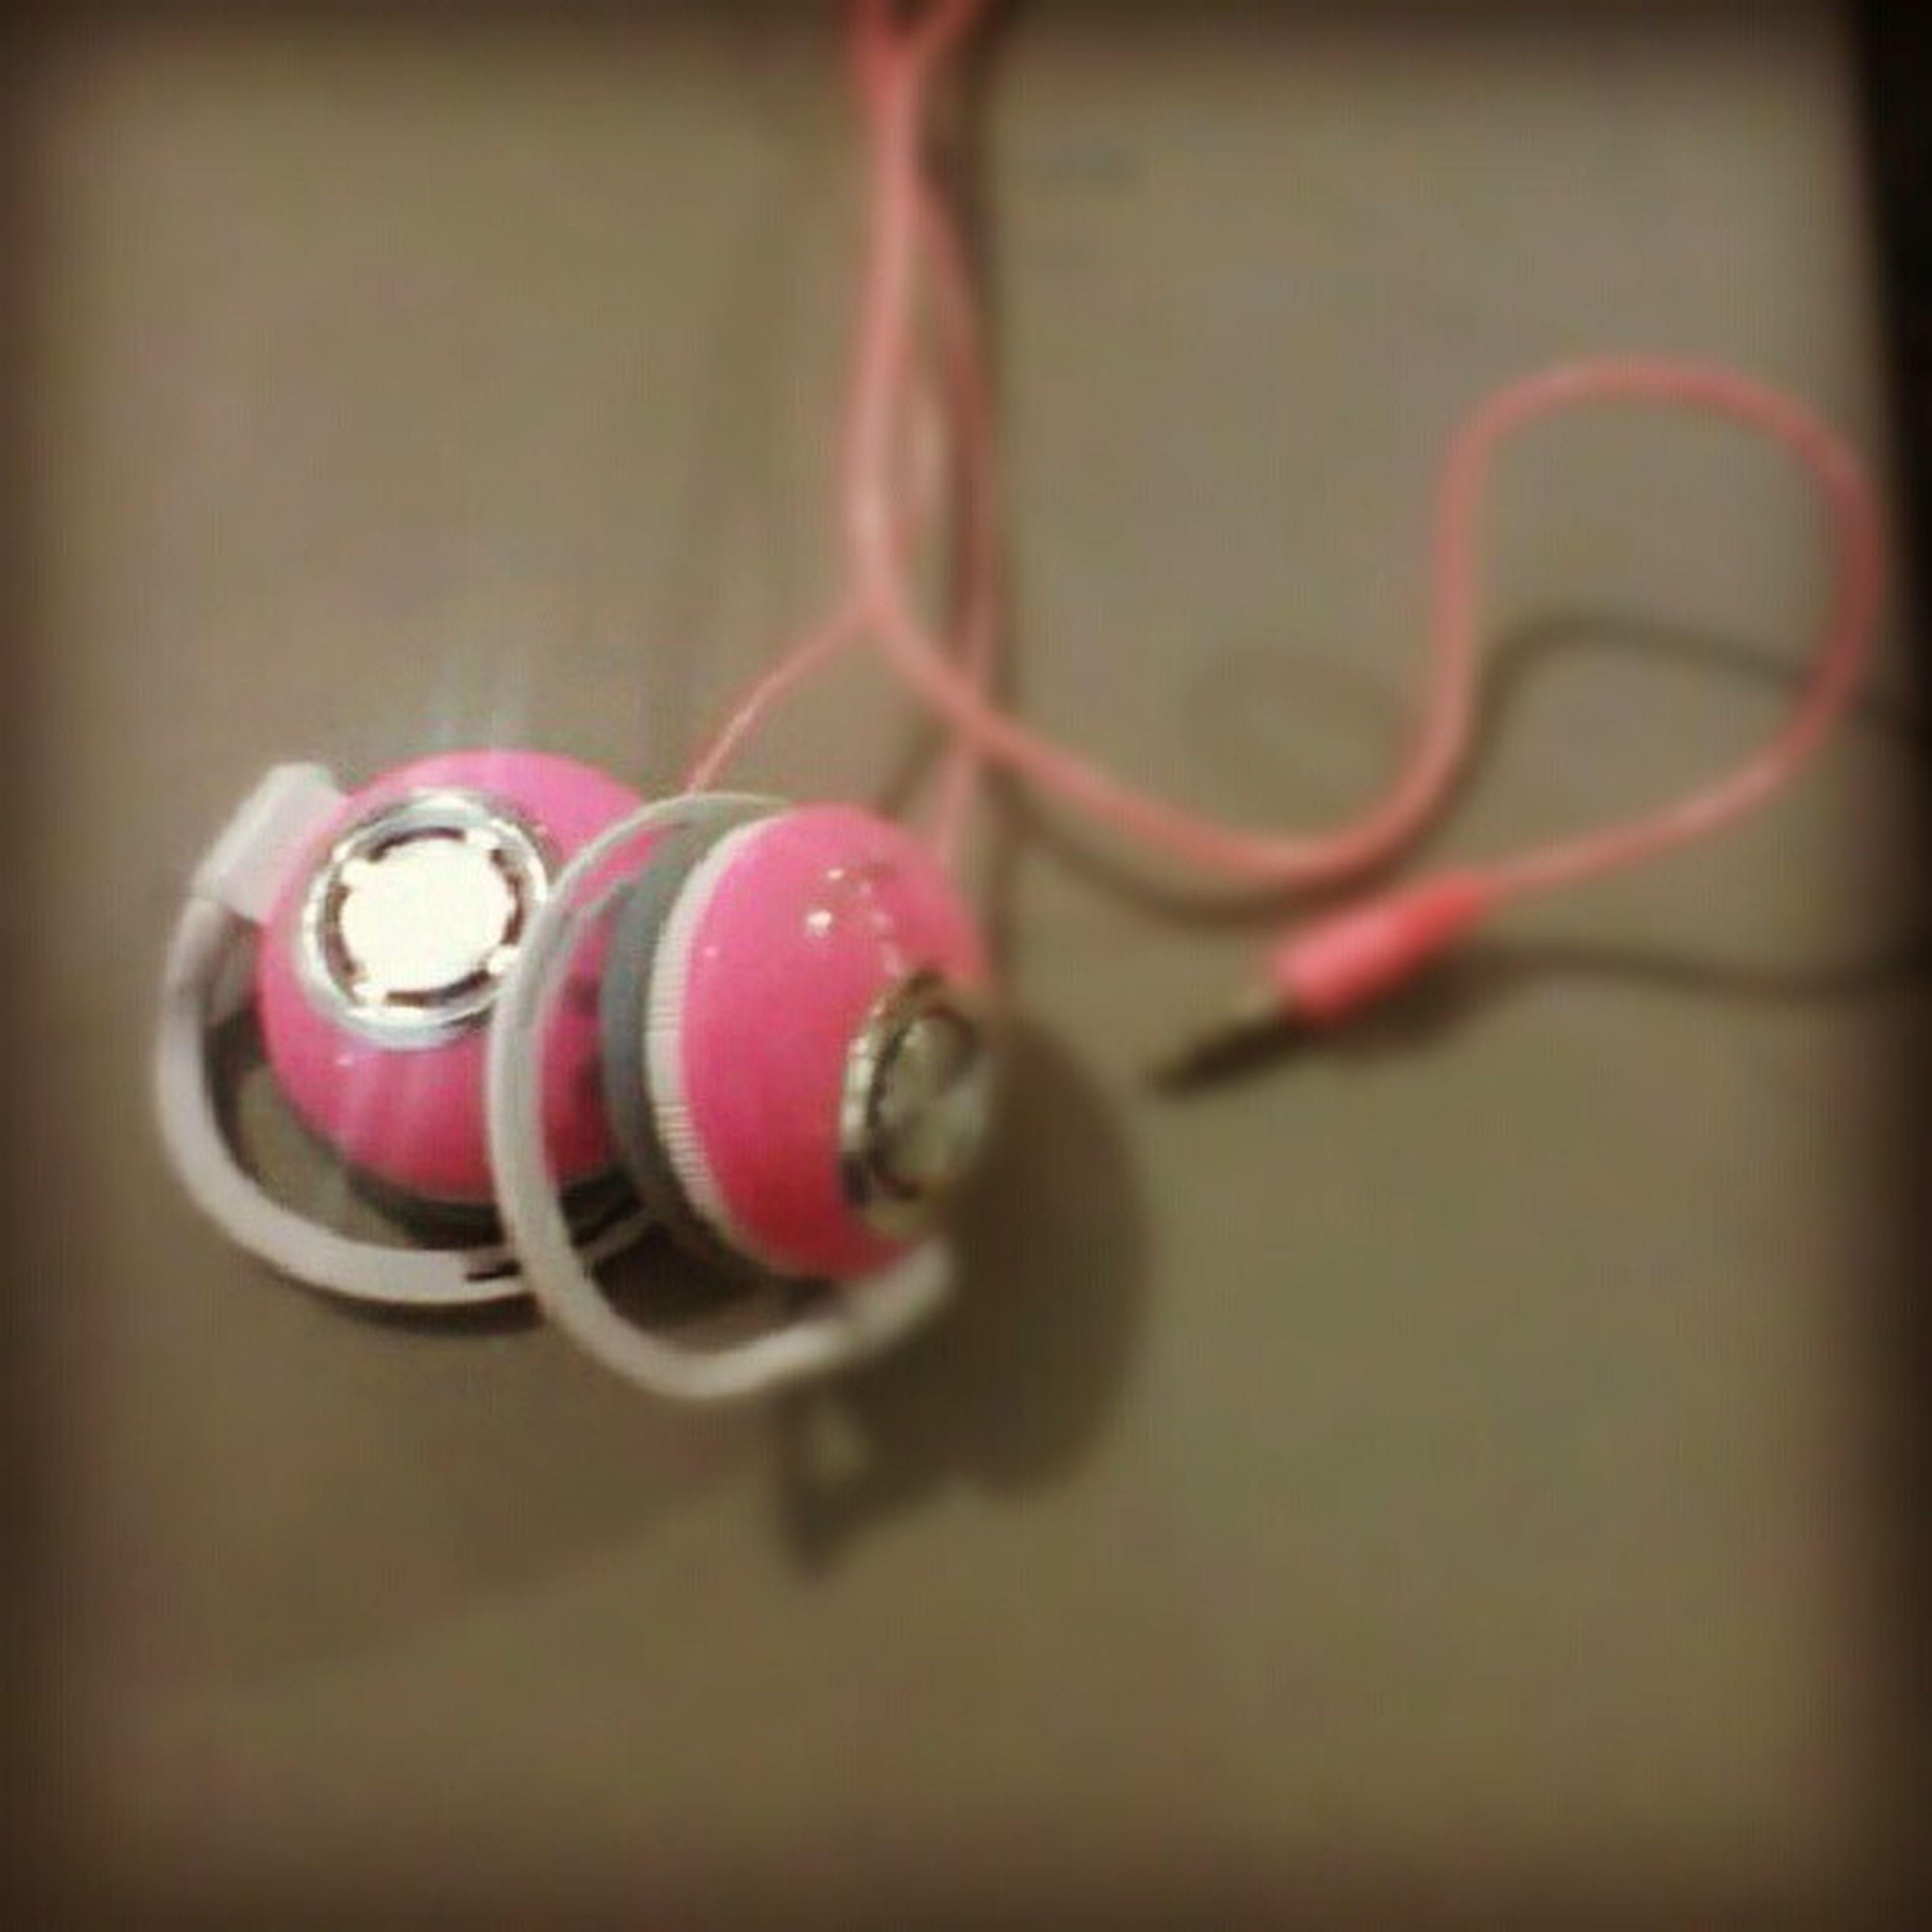 Sondell Like4like Likeforlike . Istagram headphone iphone iphonesia insracool cool muth world zika